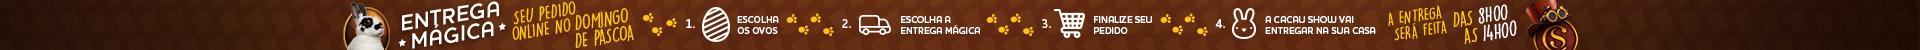 EntregaMagica